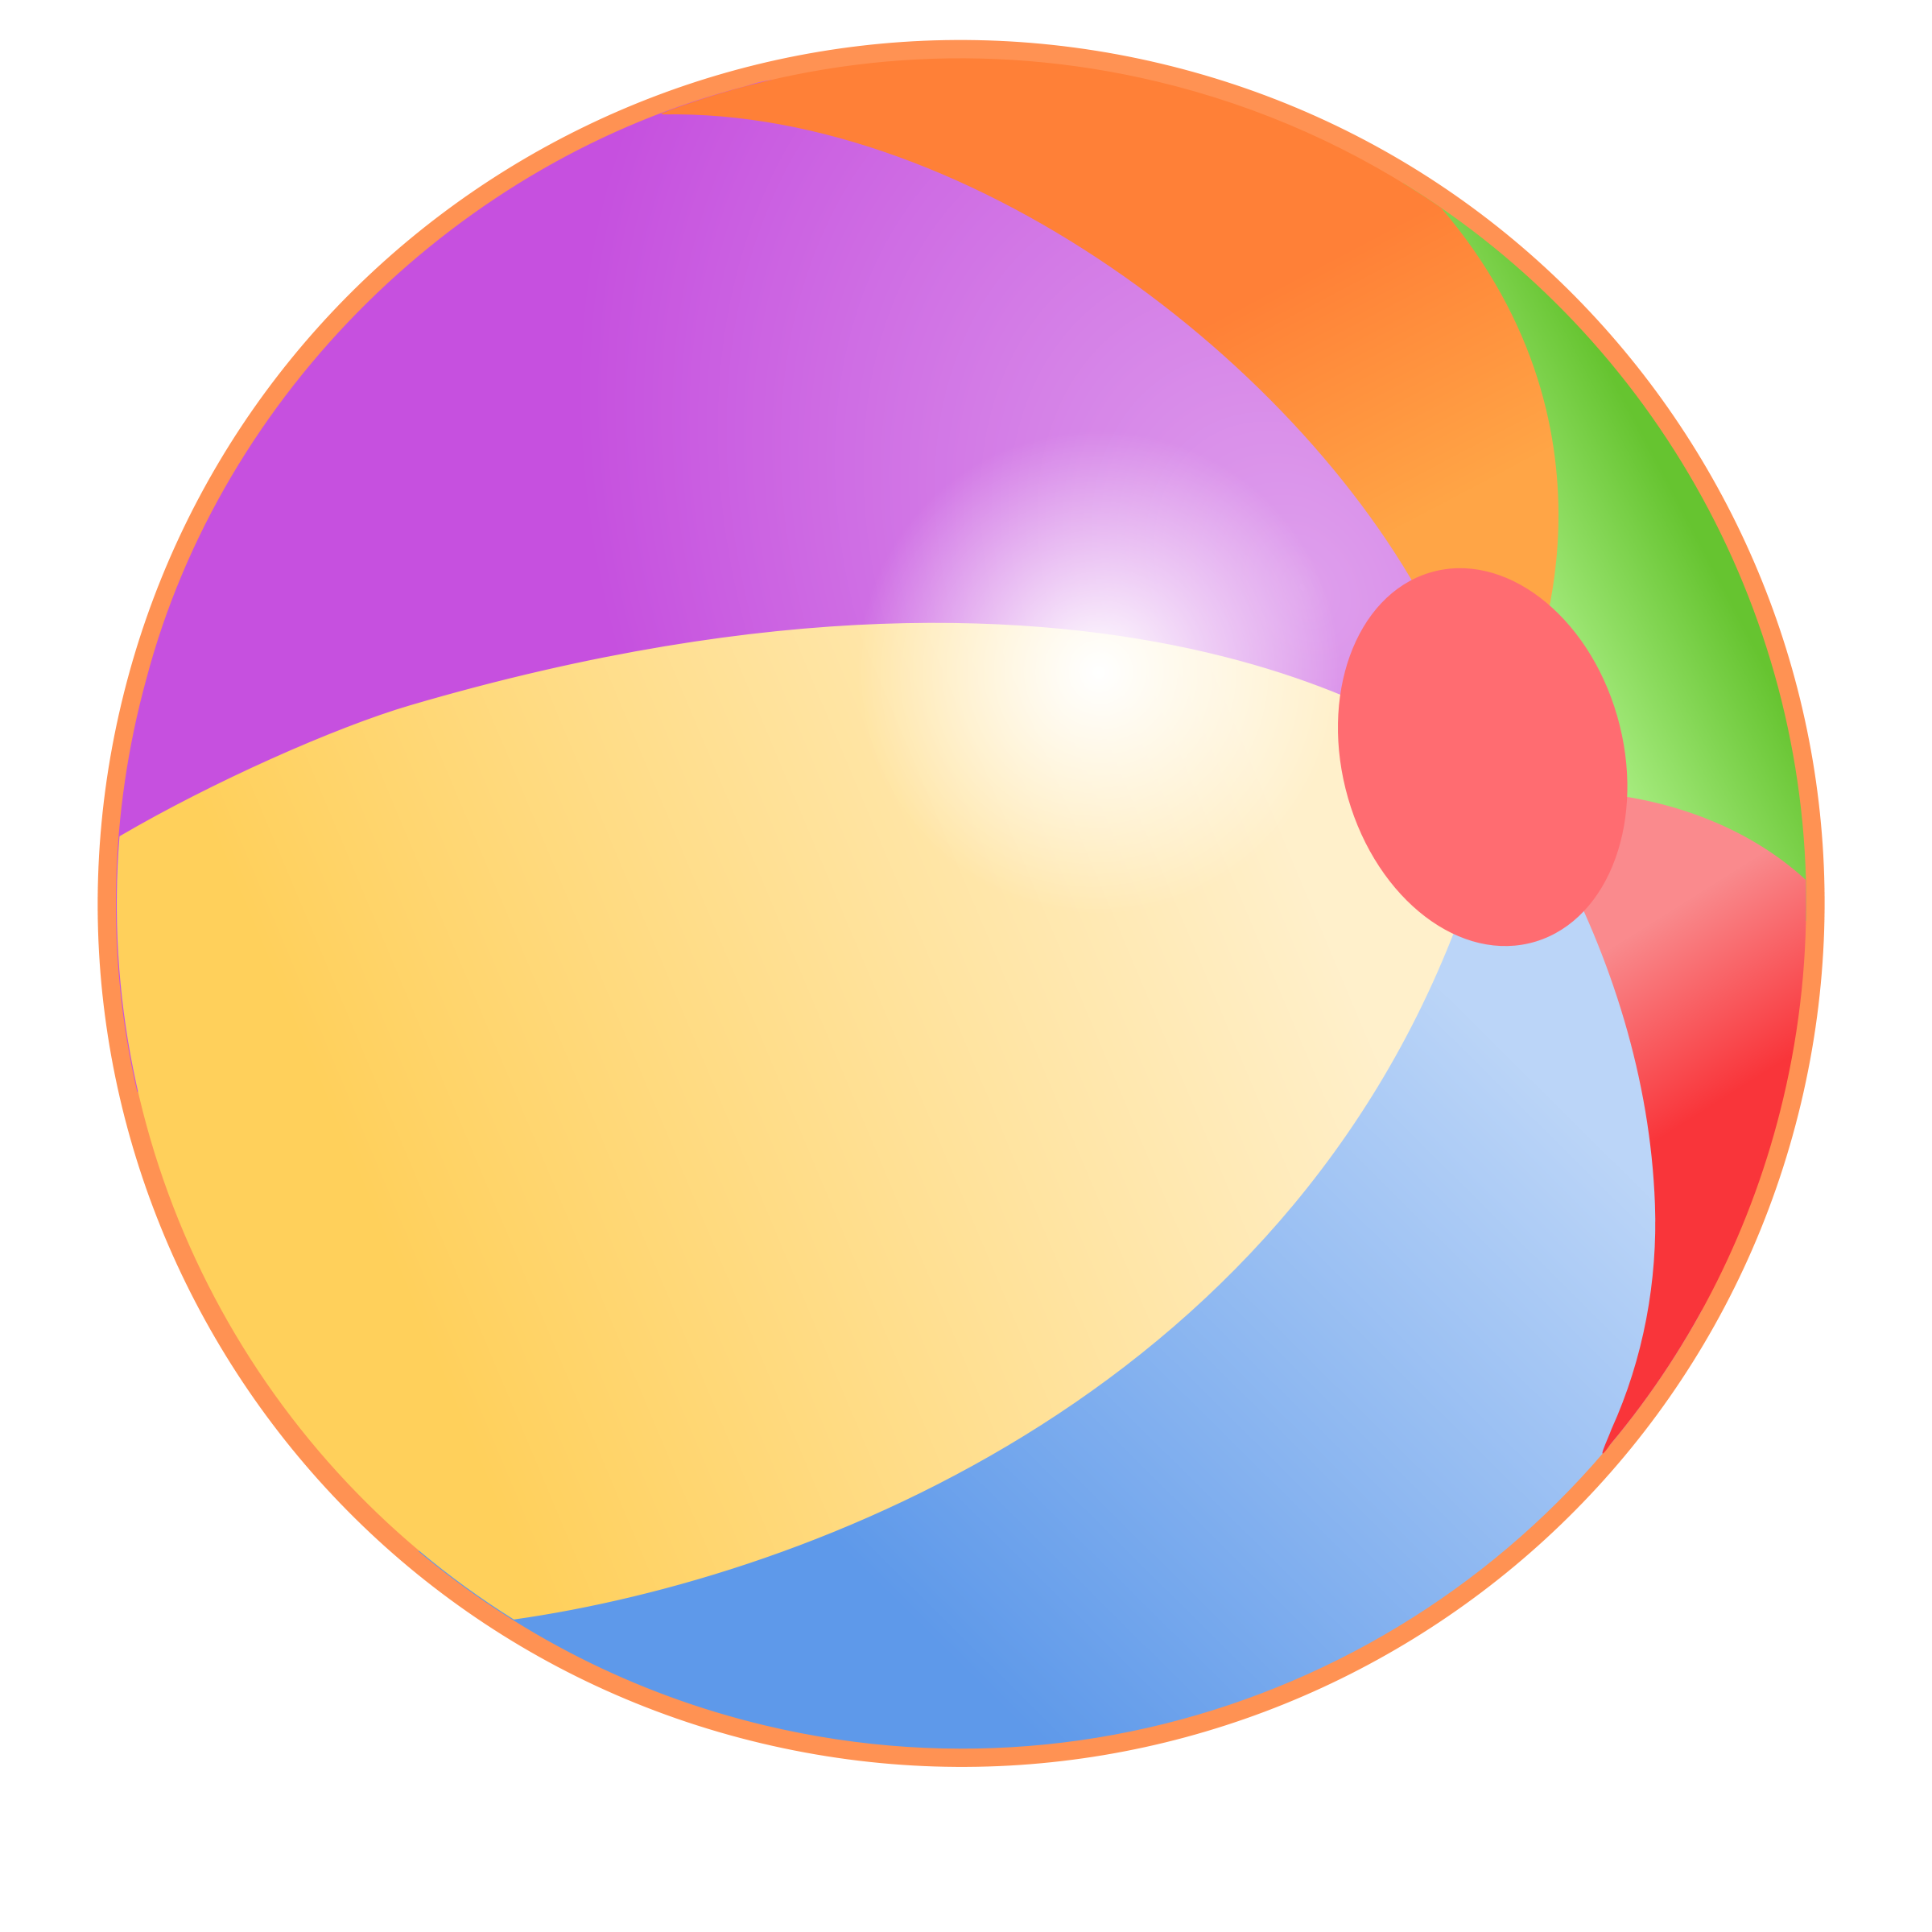 Beach ball clipart transparent background clipart free Beach Ball PNG Transparent Images | PNG All clipart free